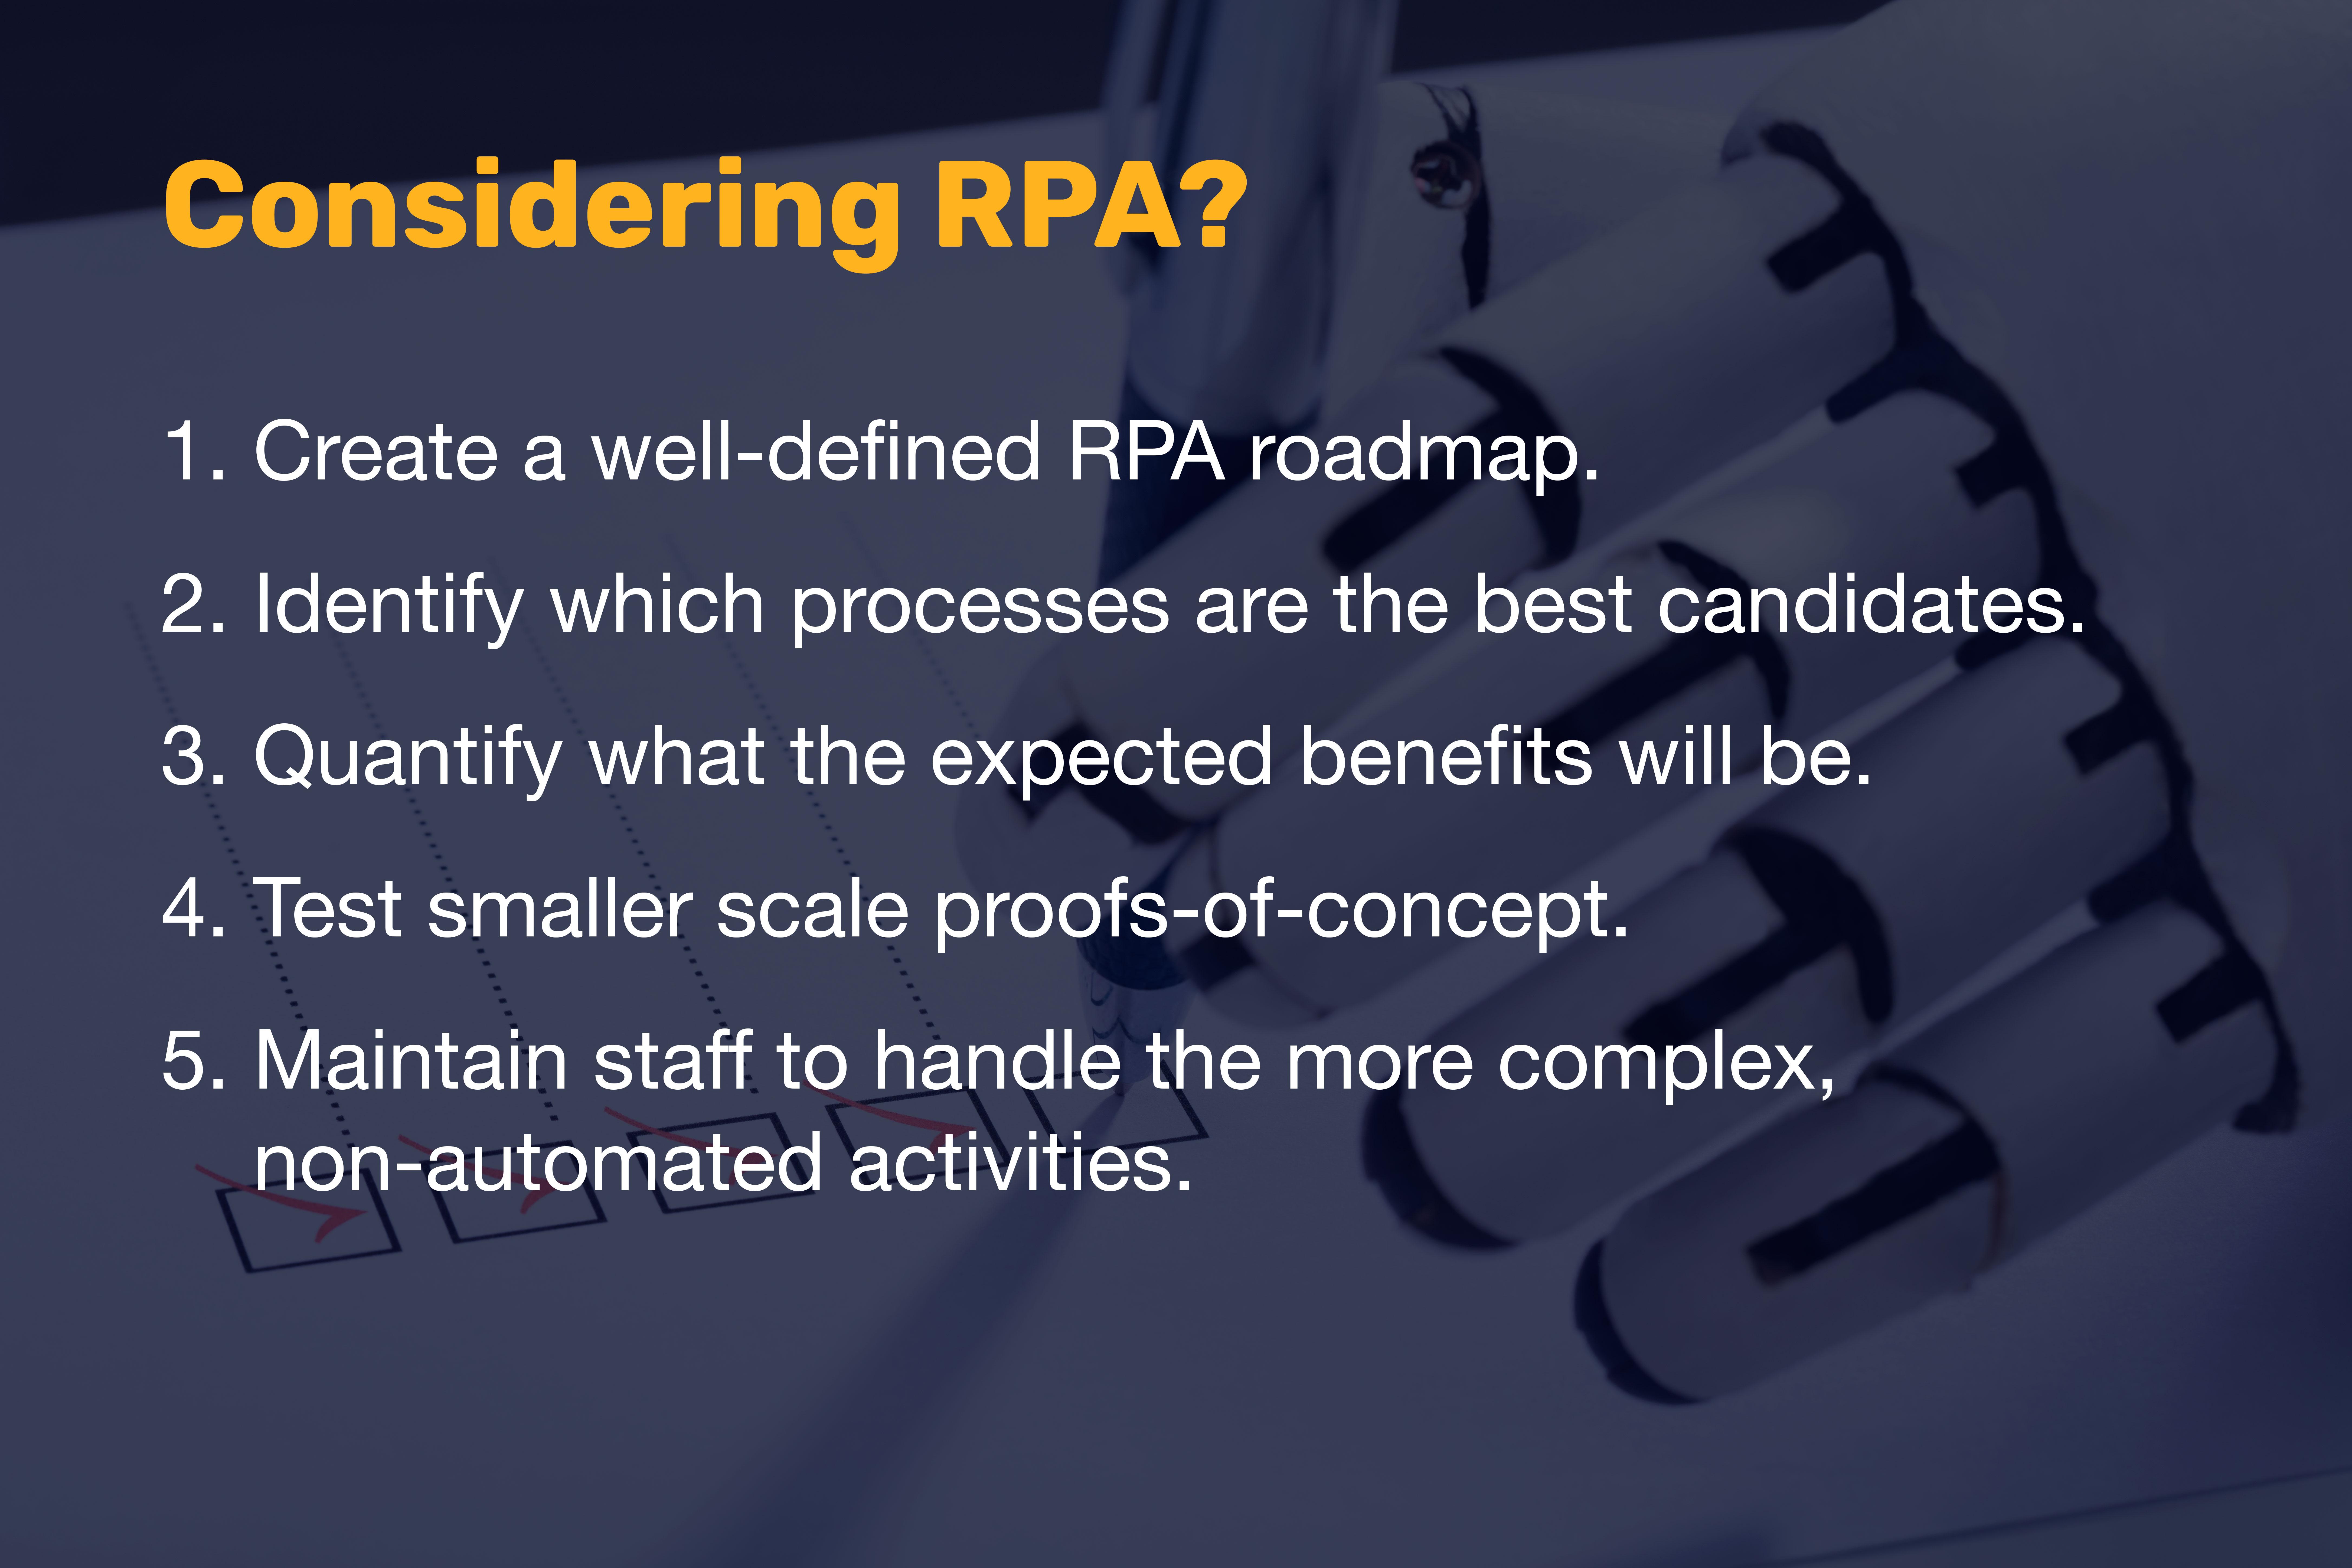 ConsideringRPA?_Auxis